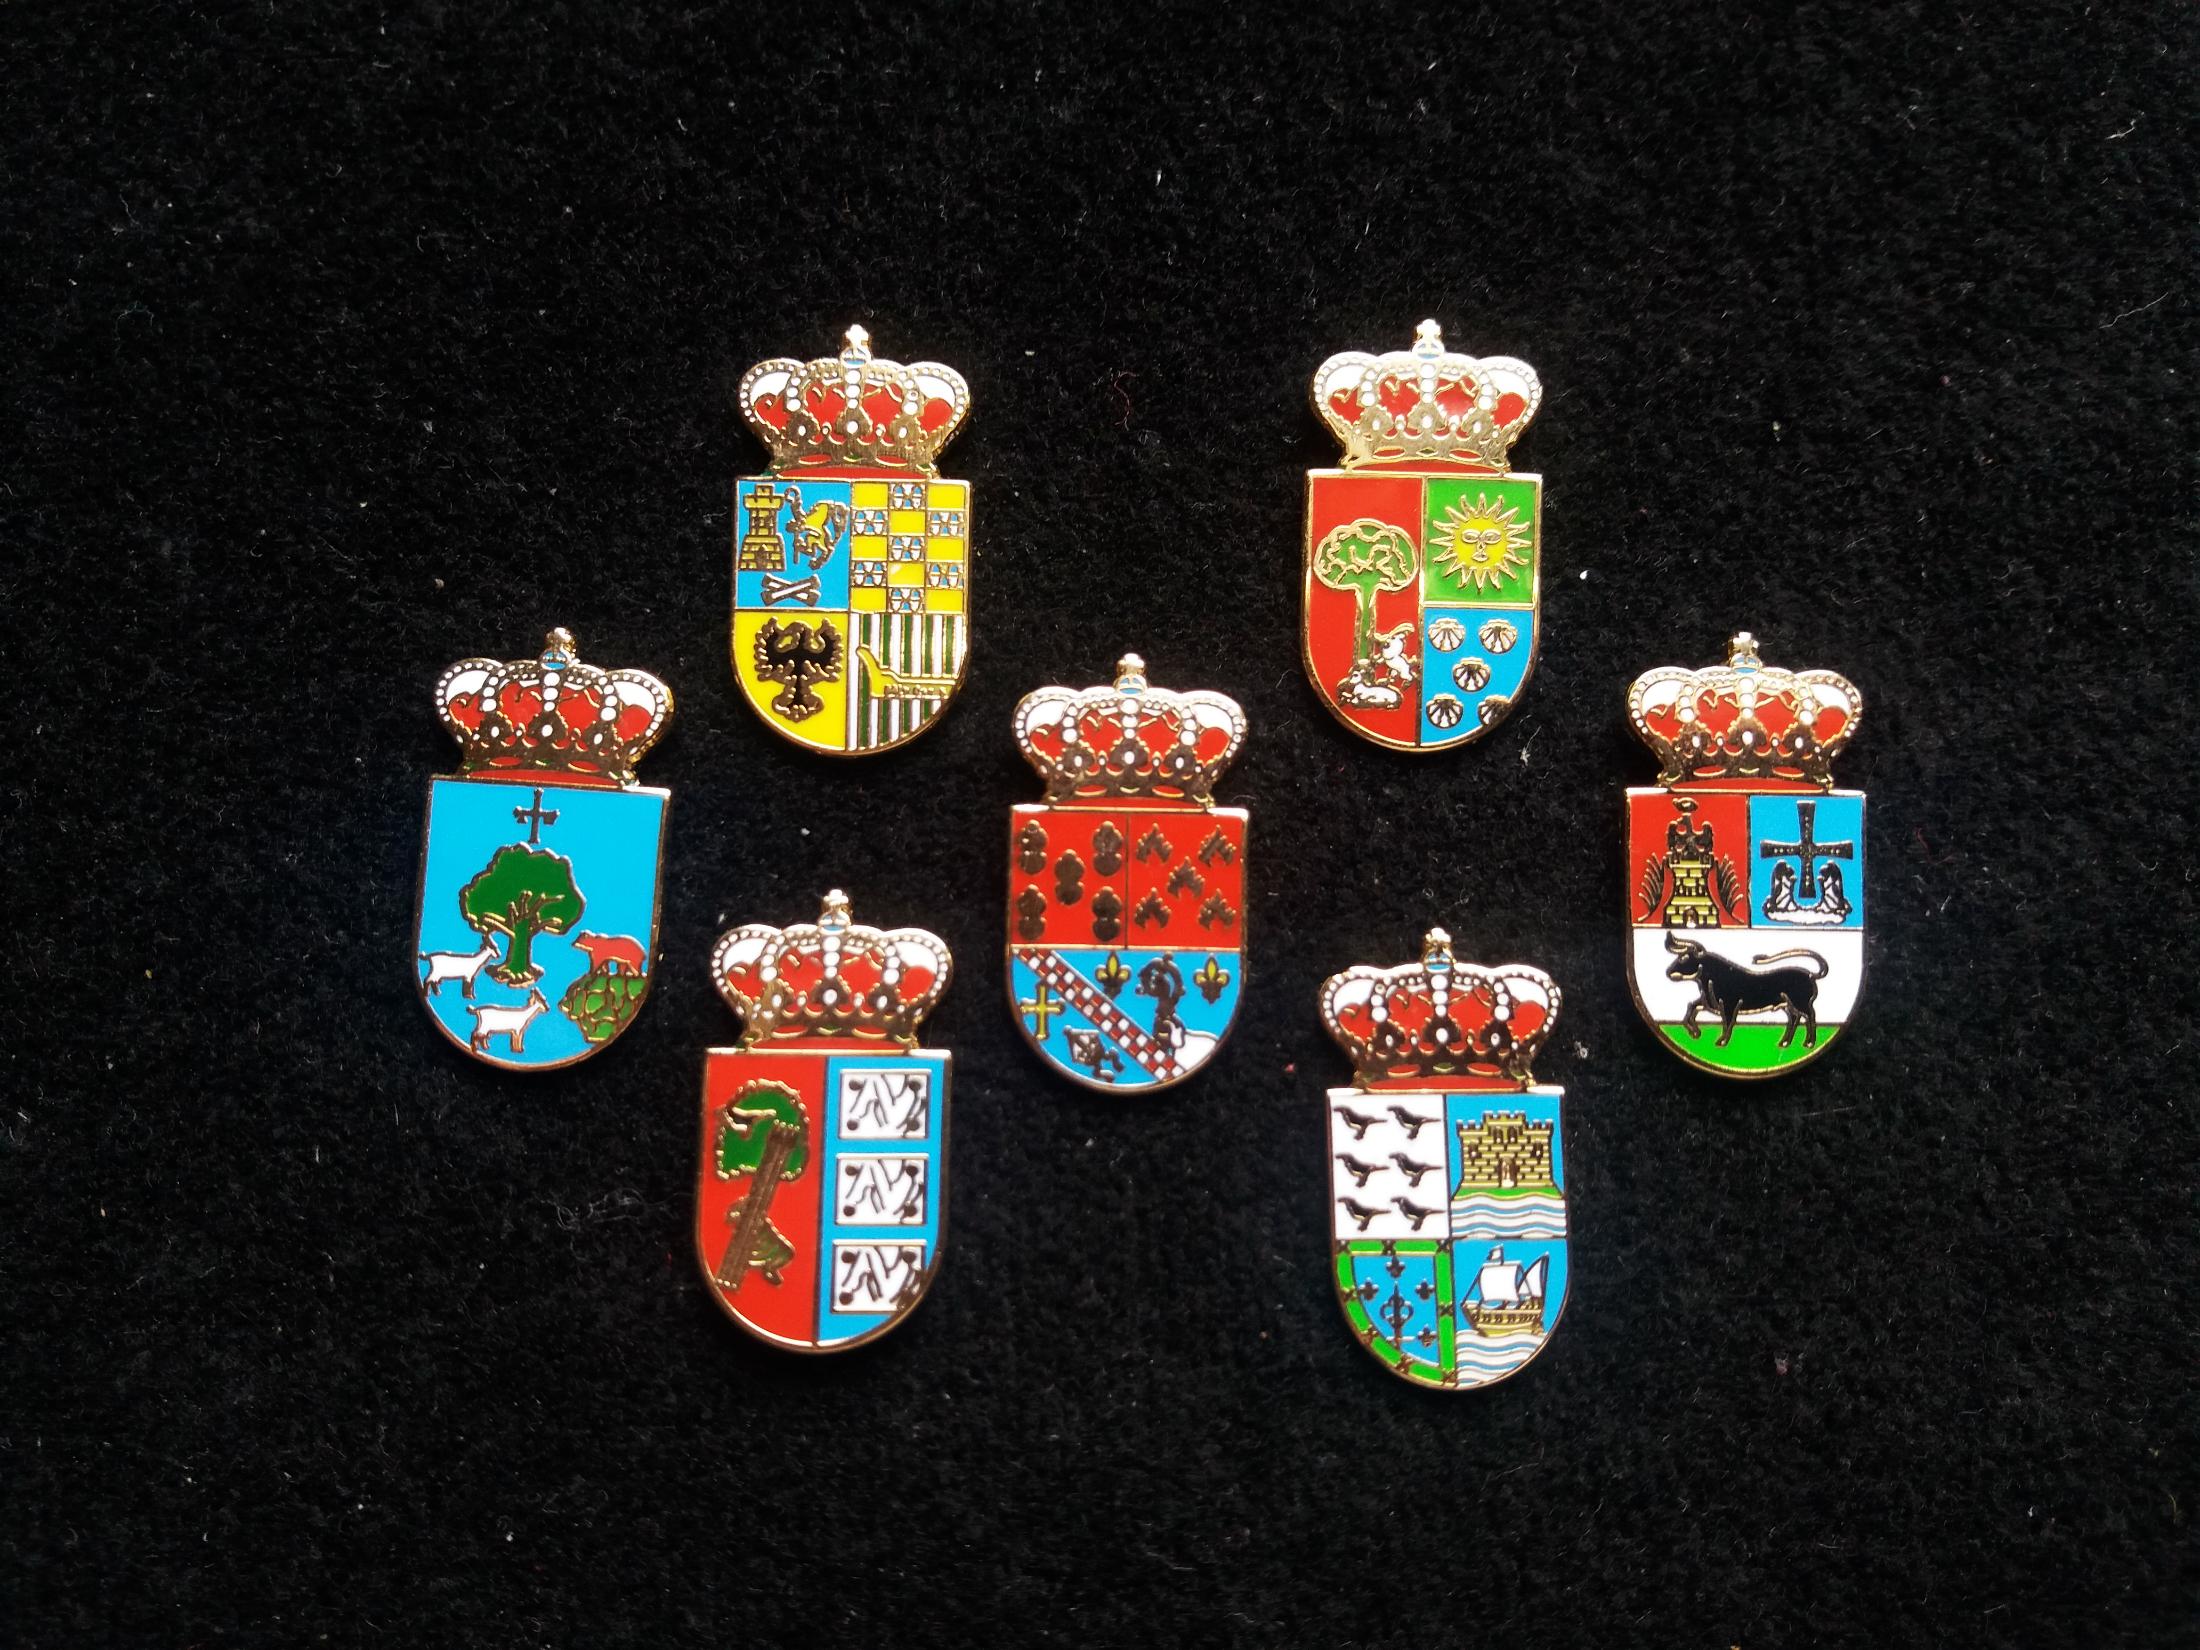 Cabrales, Cabranes, Candamo, Bimenes, Boal and Soto del Barco heraldic pins